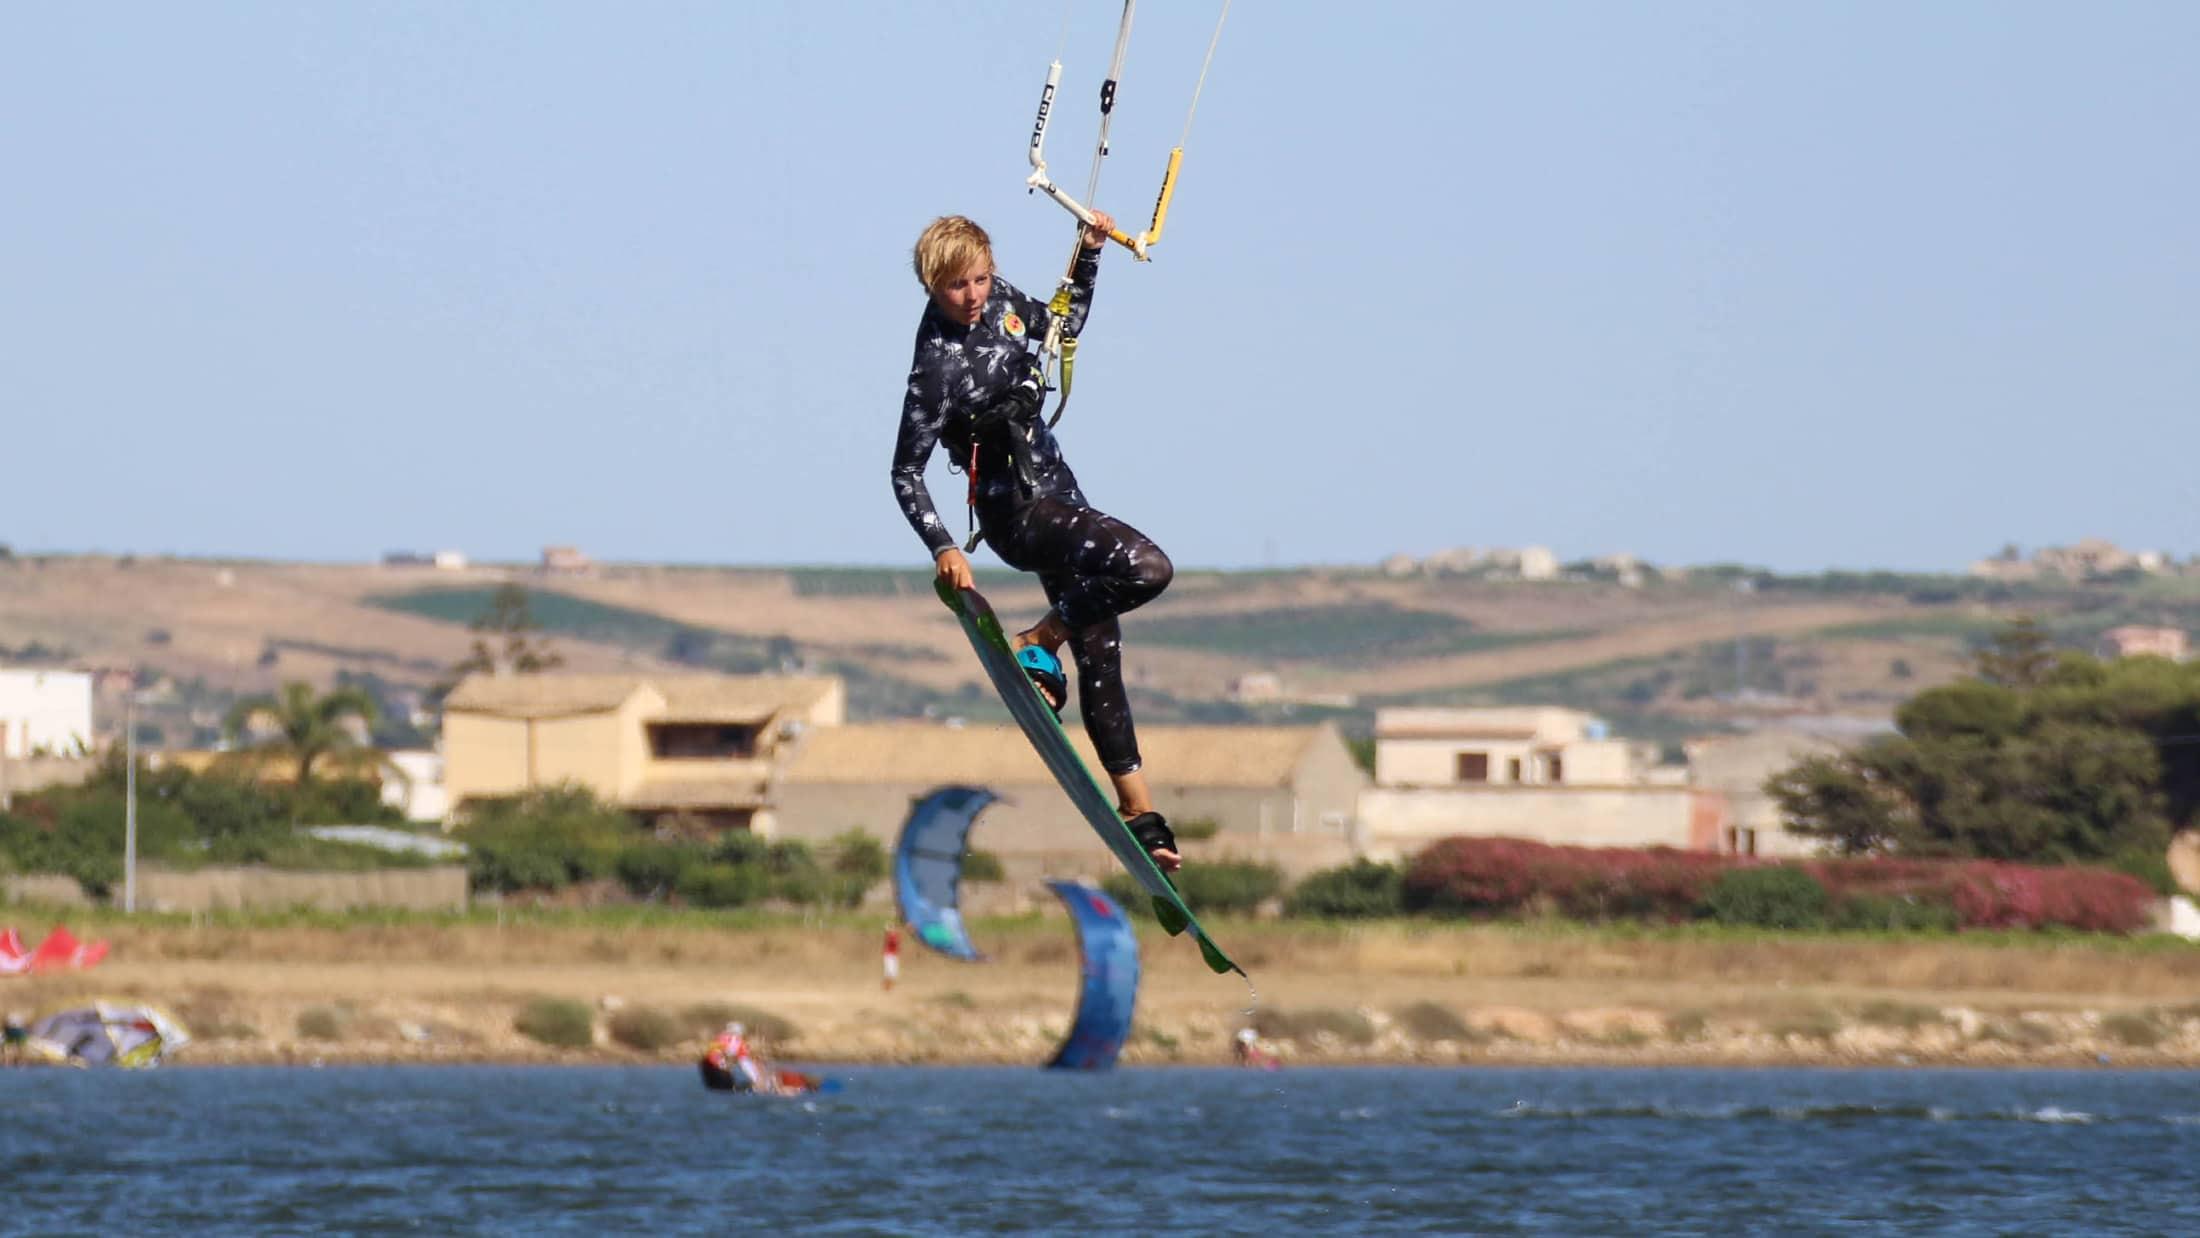 Lo-Stagnone-Lagne-marsala-kitesurf-Sicile-Best-Spot-Kitesurfing-Sicilia-Flow-Kite-School-Cabrinha-duotone-sup-stand-up-paddle-board-kiteboarding-basic-jump-grab